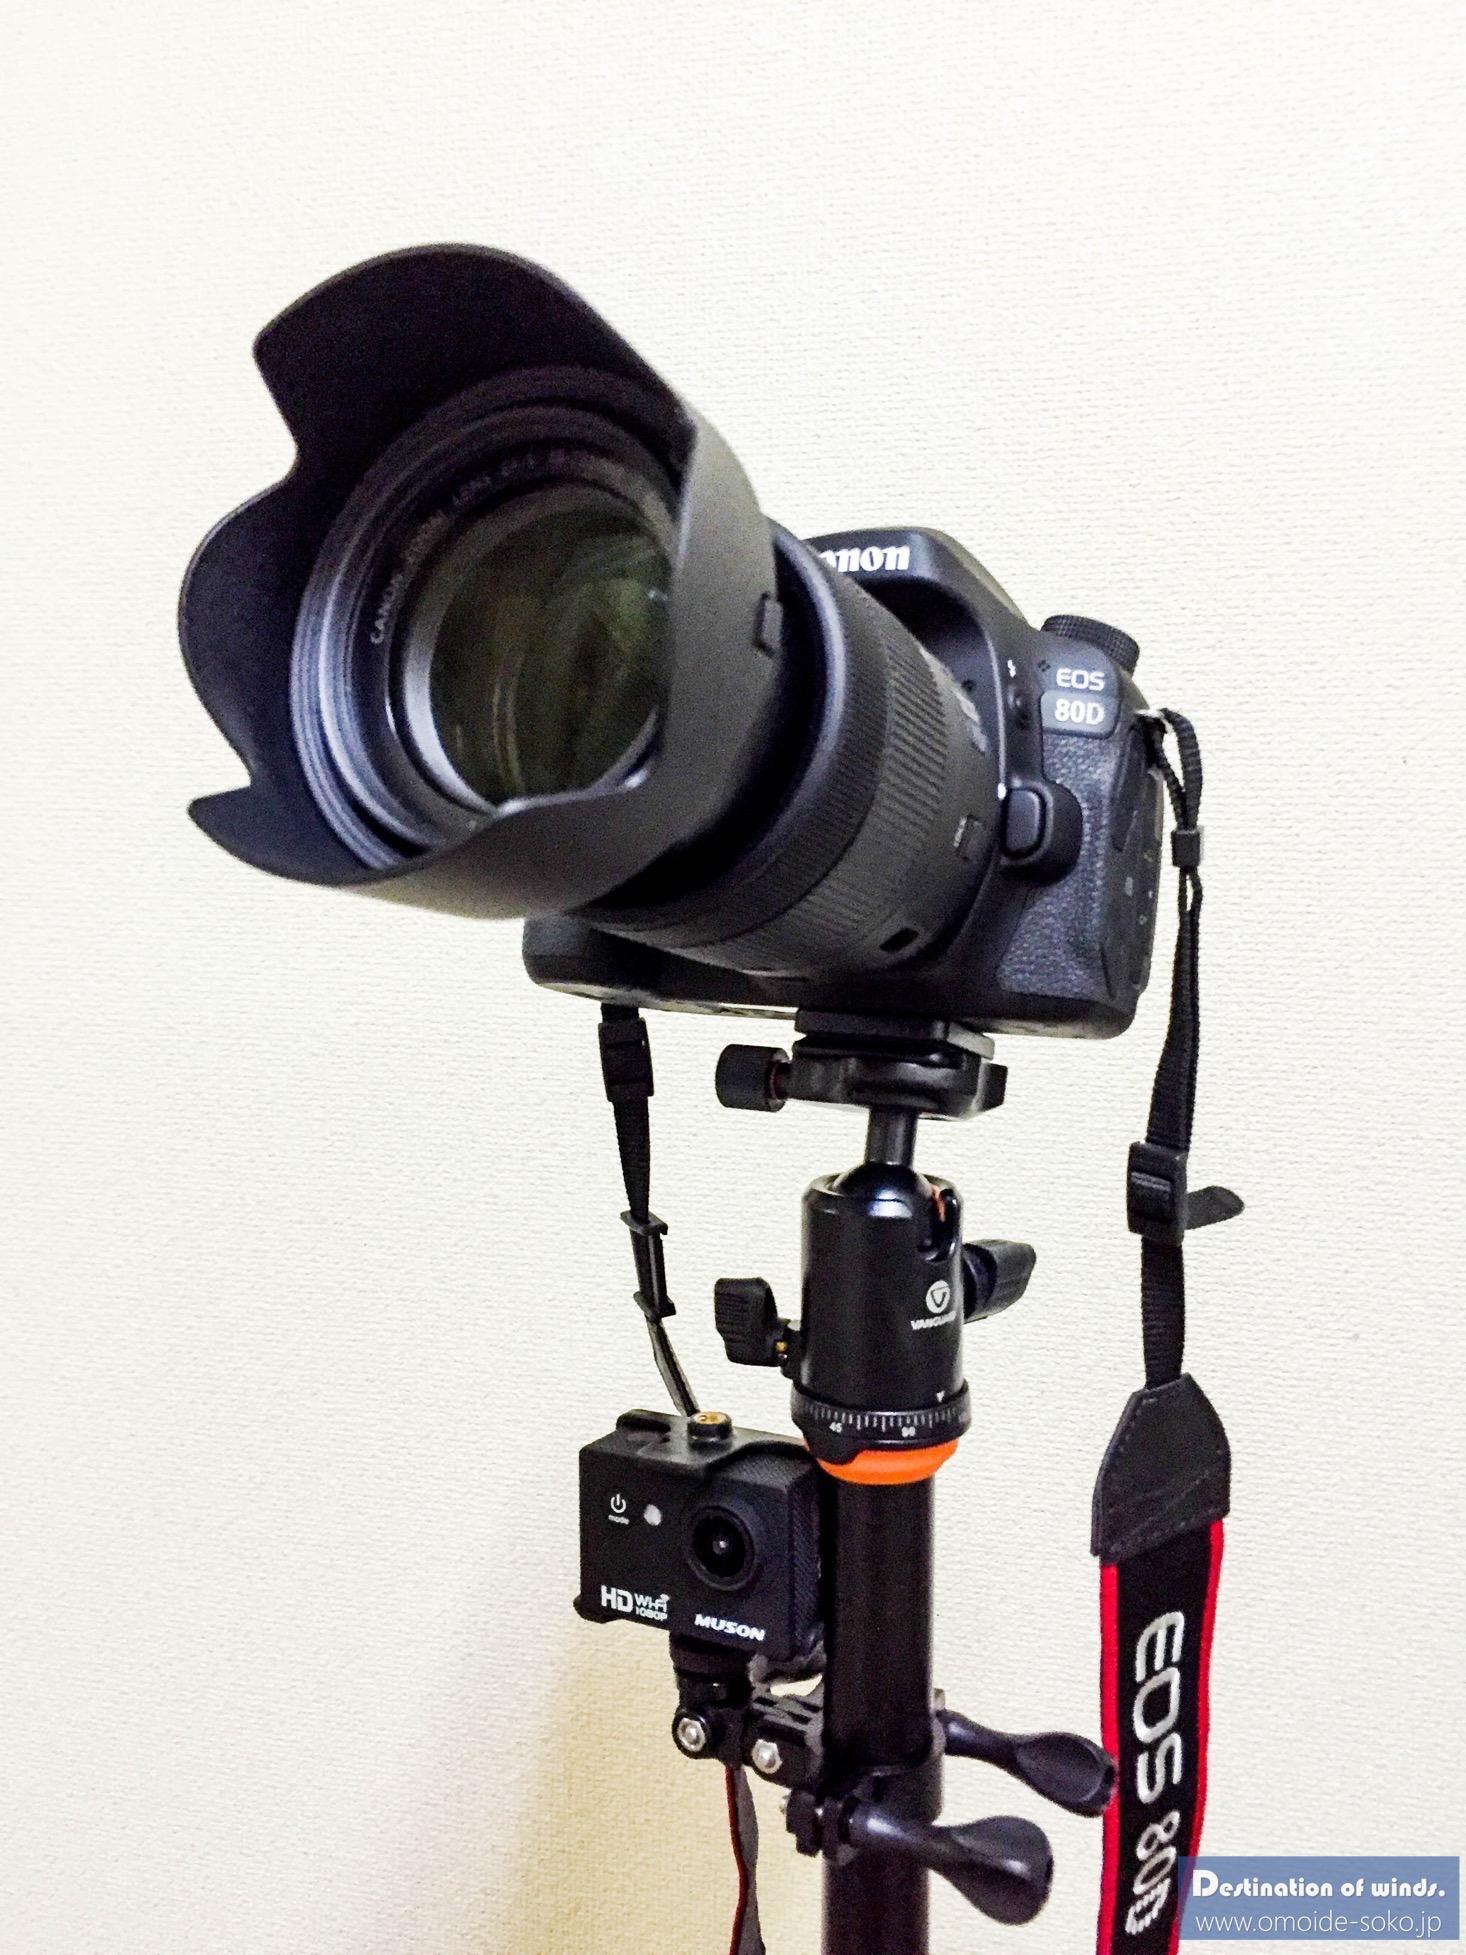 DualCamera01